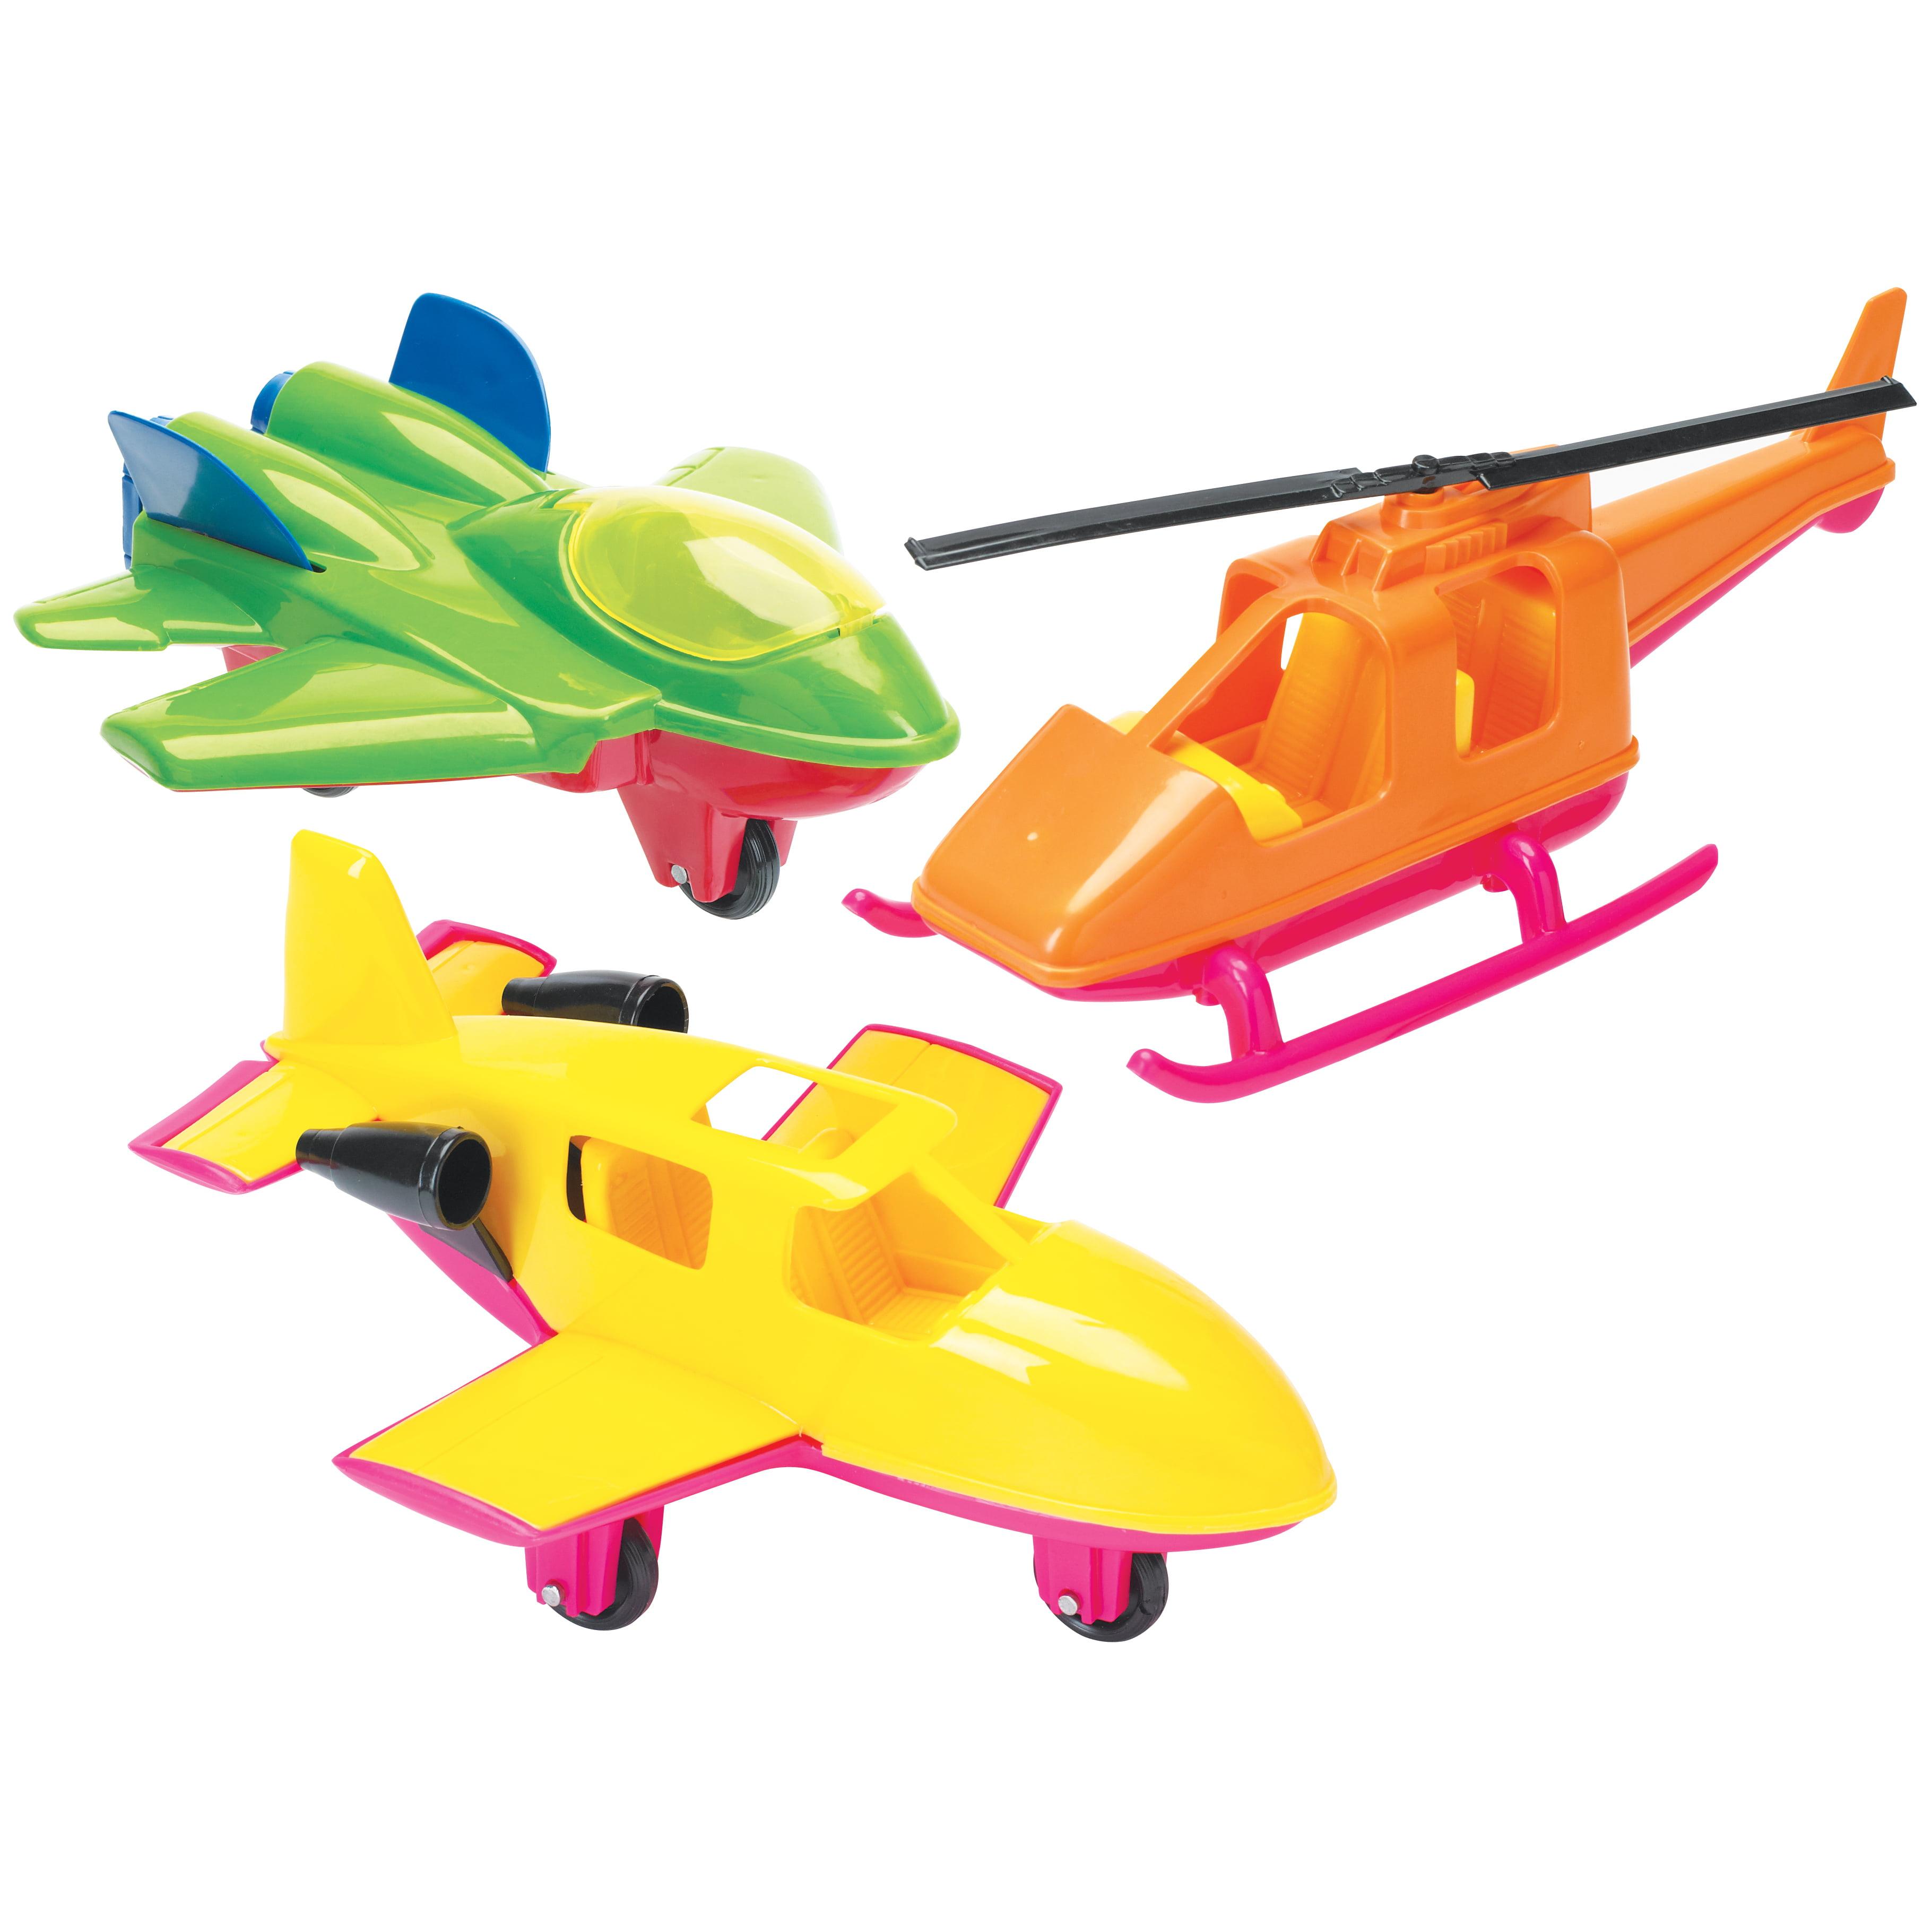 Name Drop Assorted Plastic Aircraft